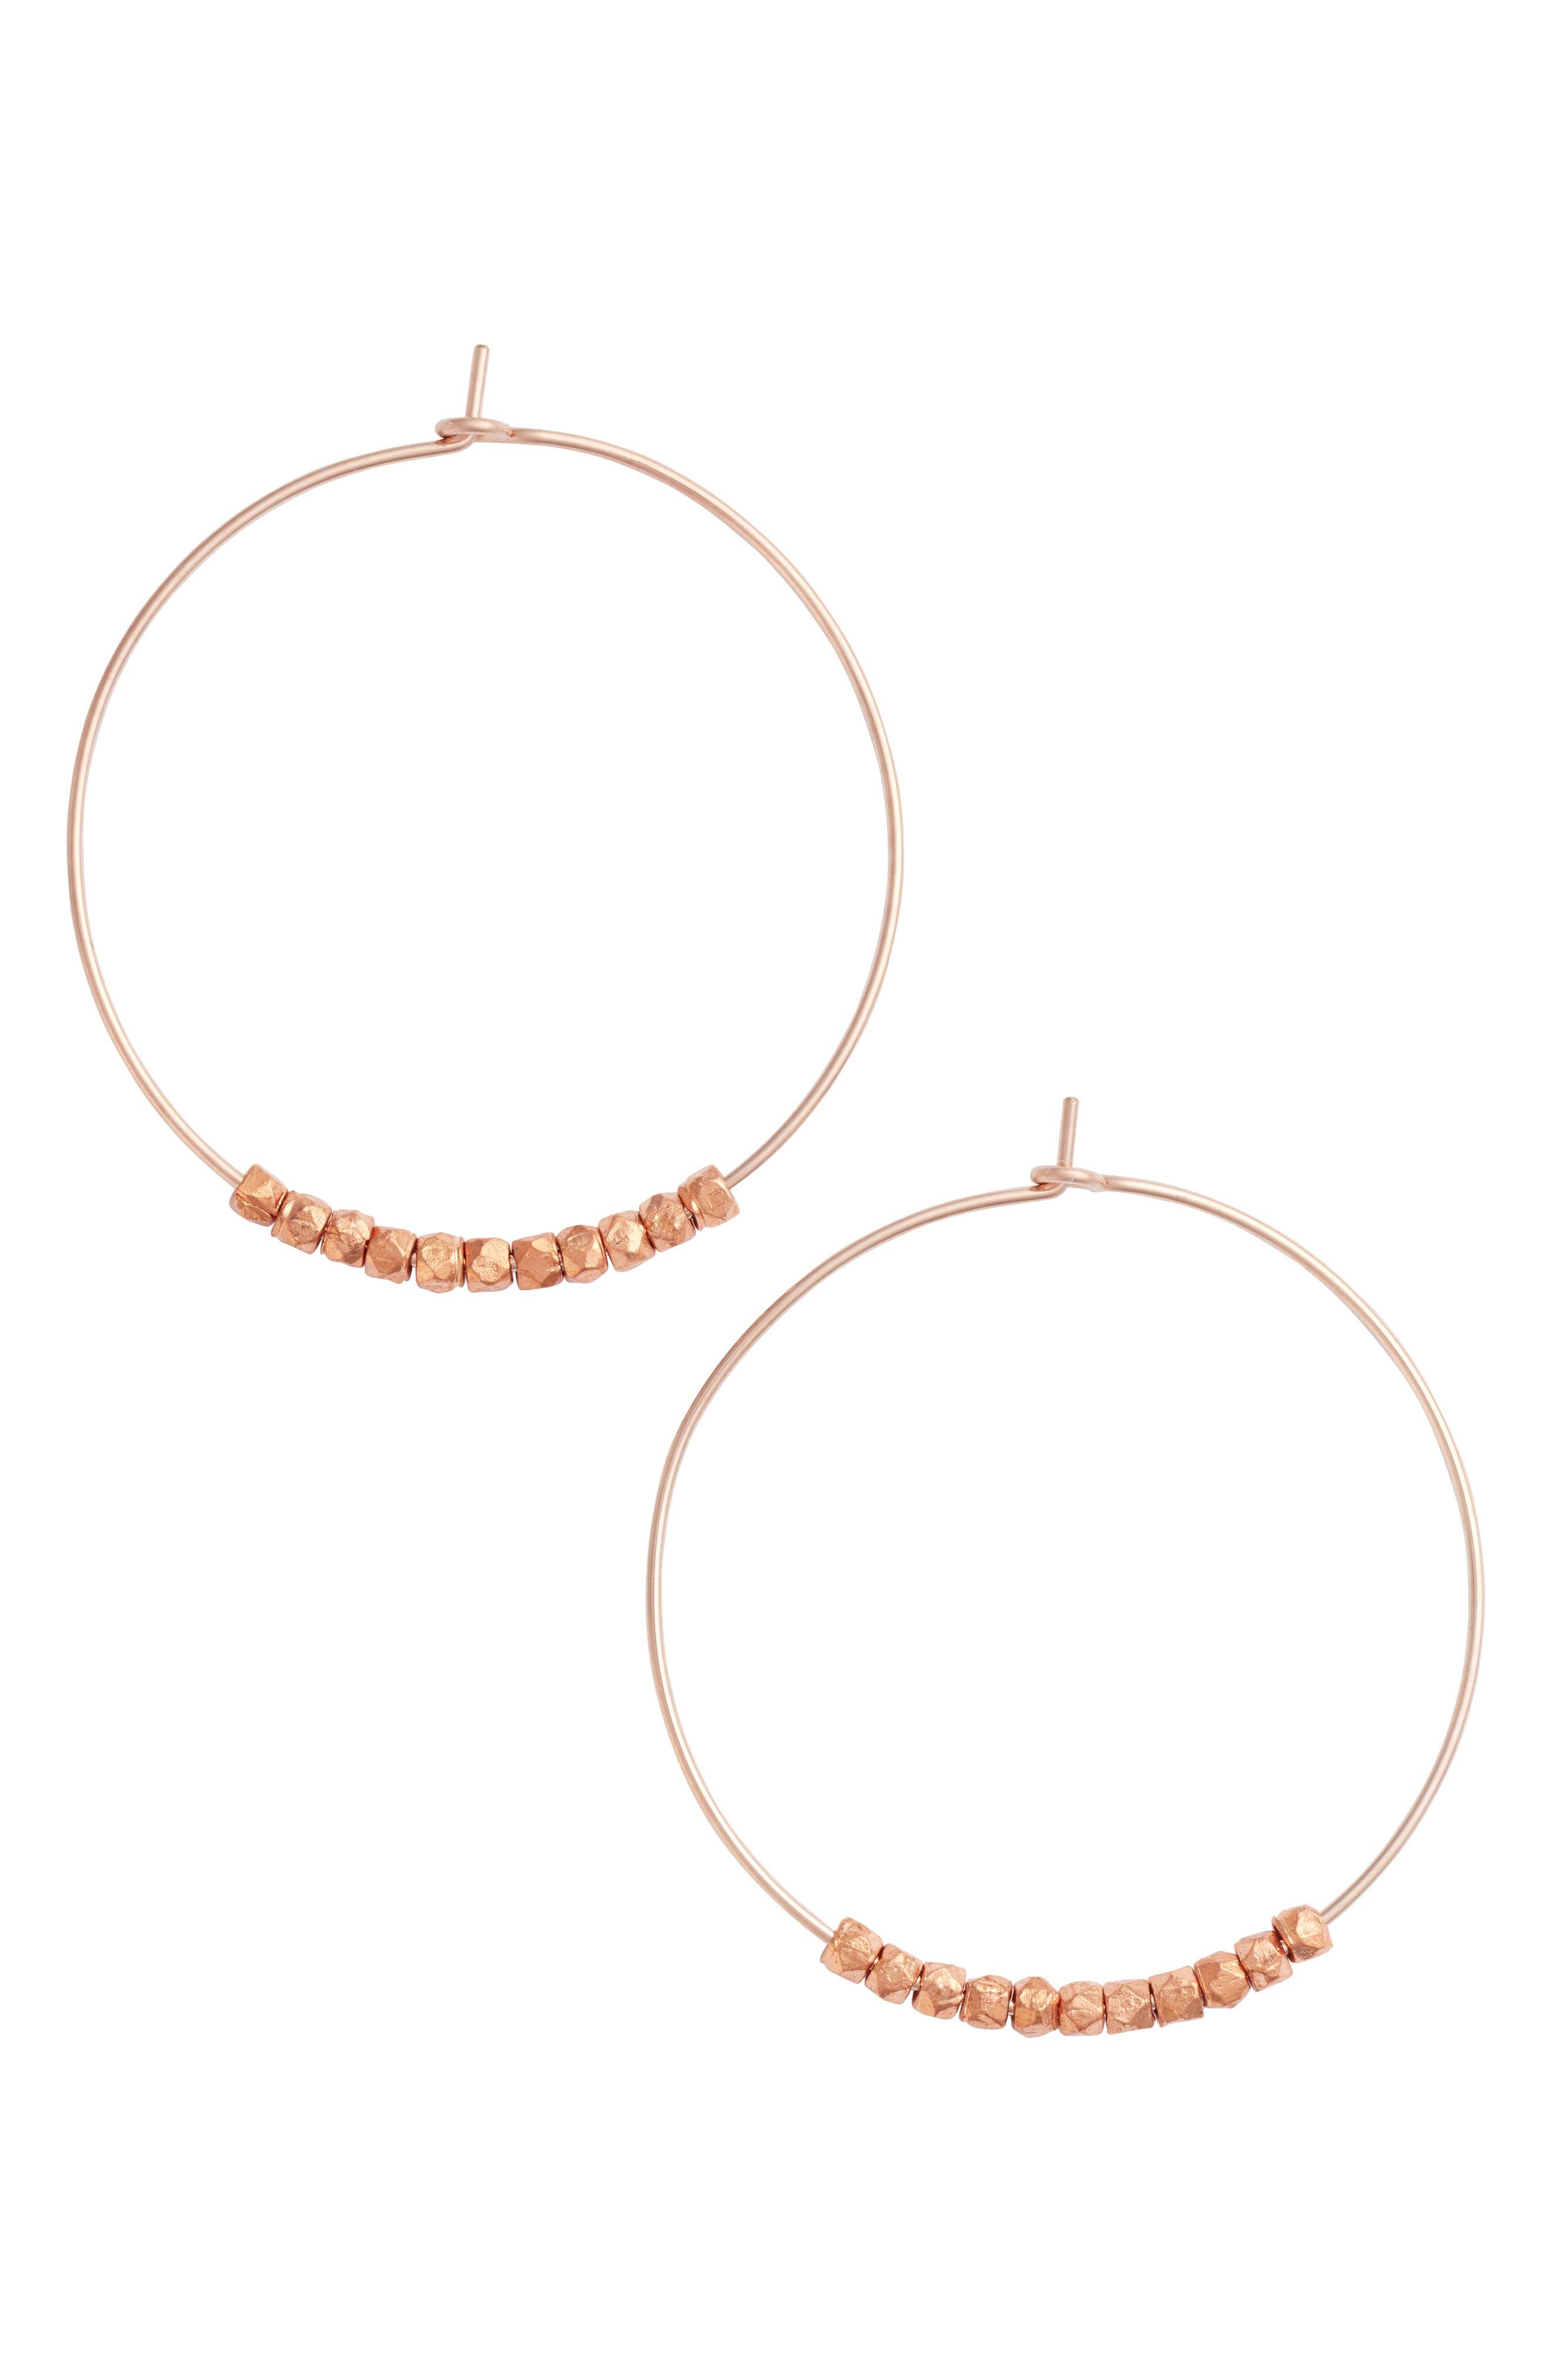 Nashelle Karly Glistening Hoop Earrings